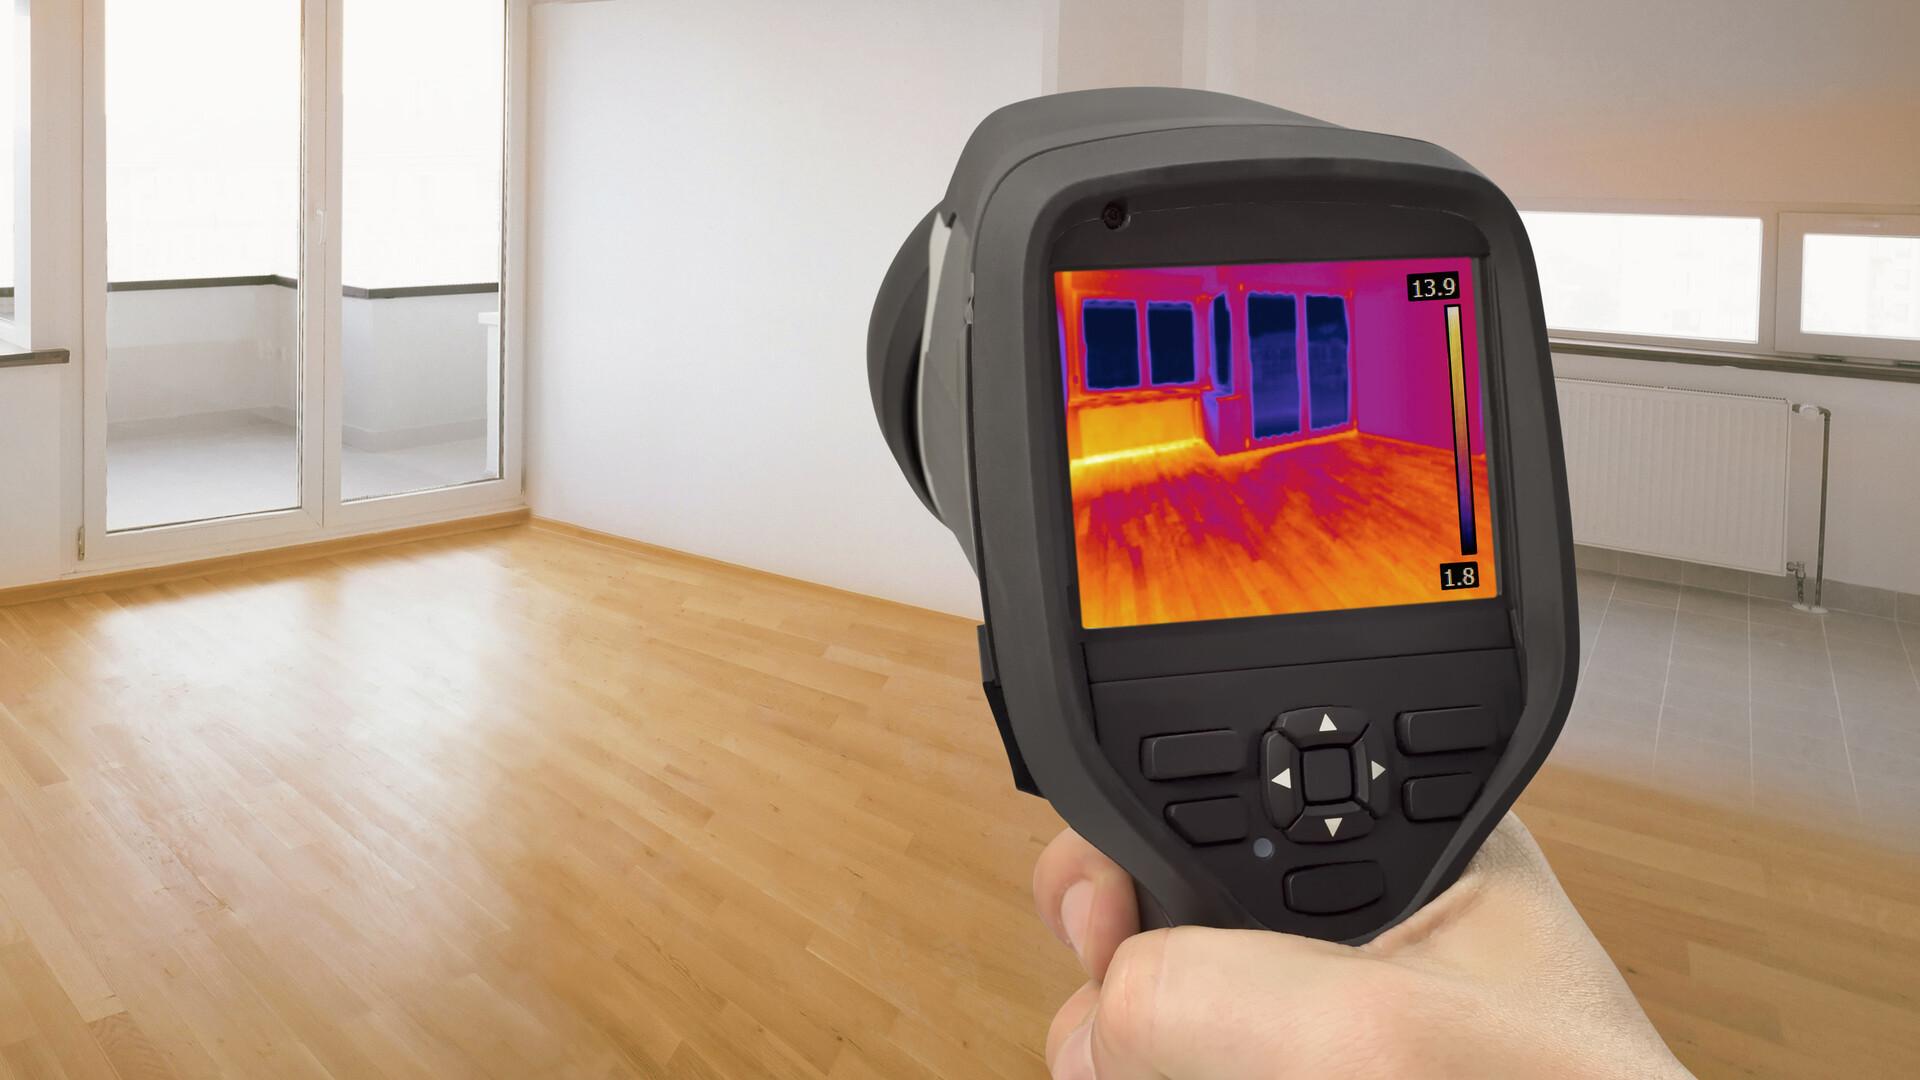 energie efficientie, energy efficiency, thermografie